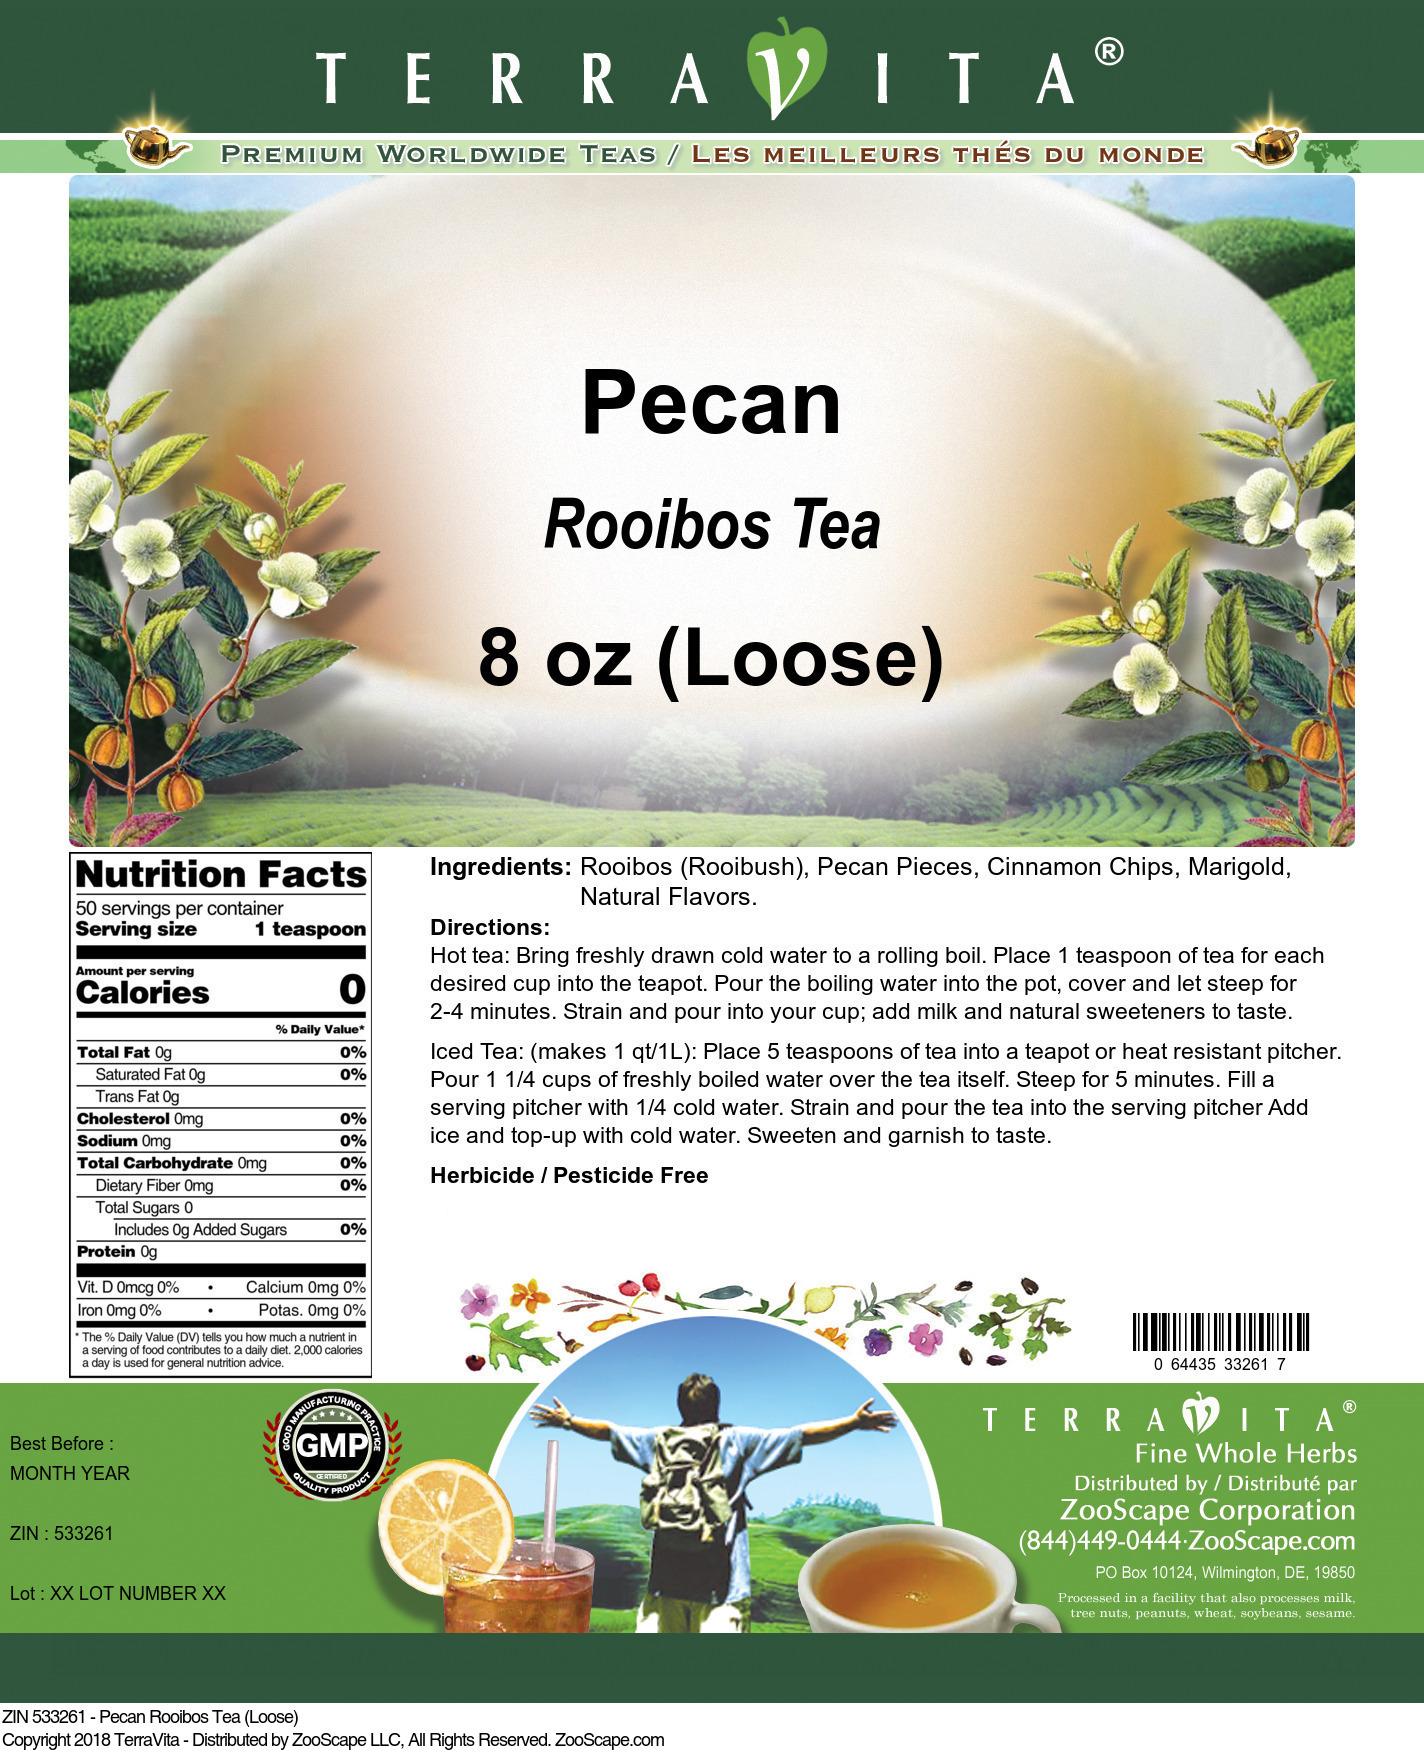 Pecan Rooibos Tea